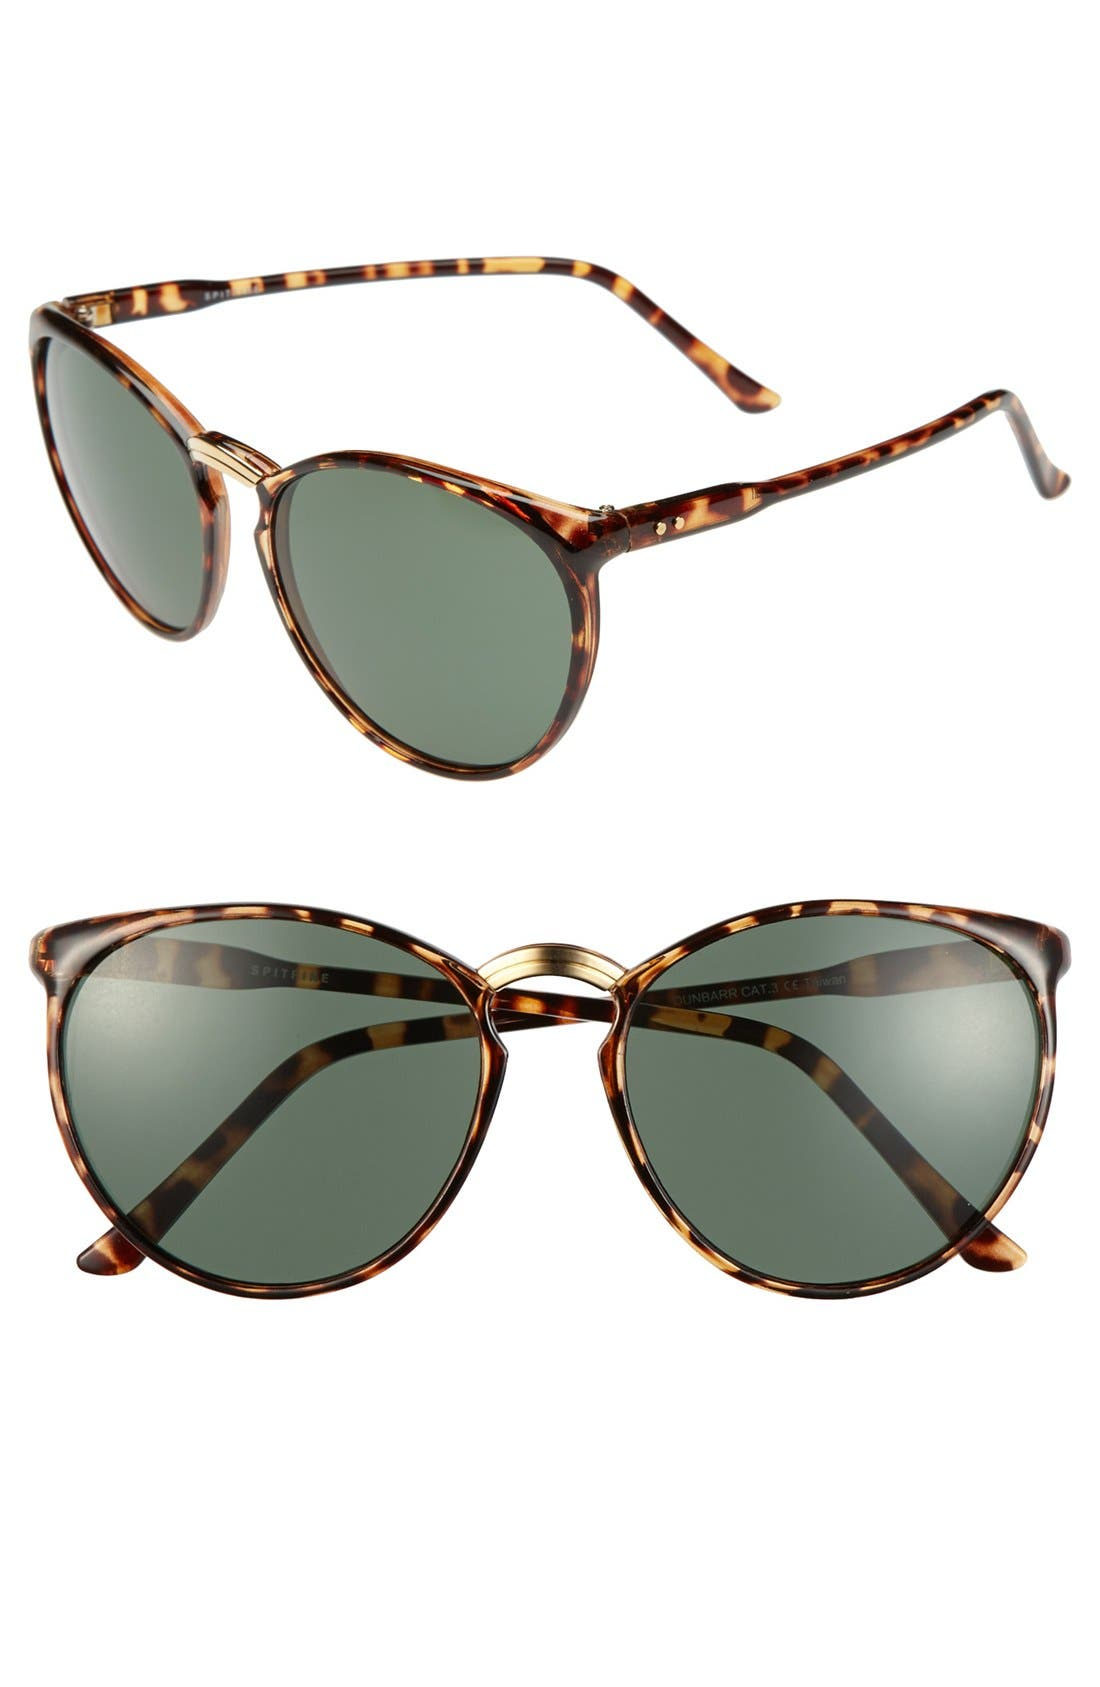 Alternate Image 1 Selected - Spitfire 'Dunbarr' 50mm Retro Sunglasses